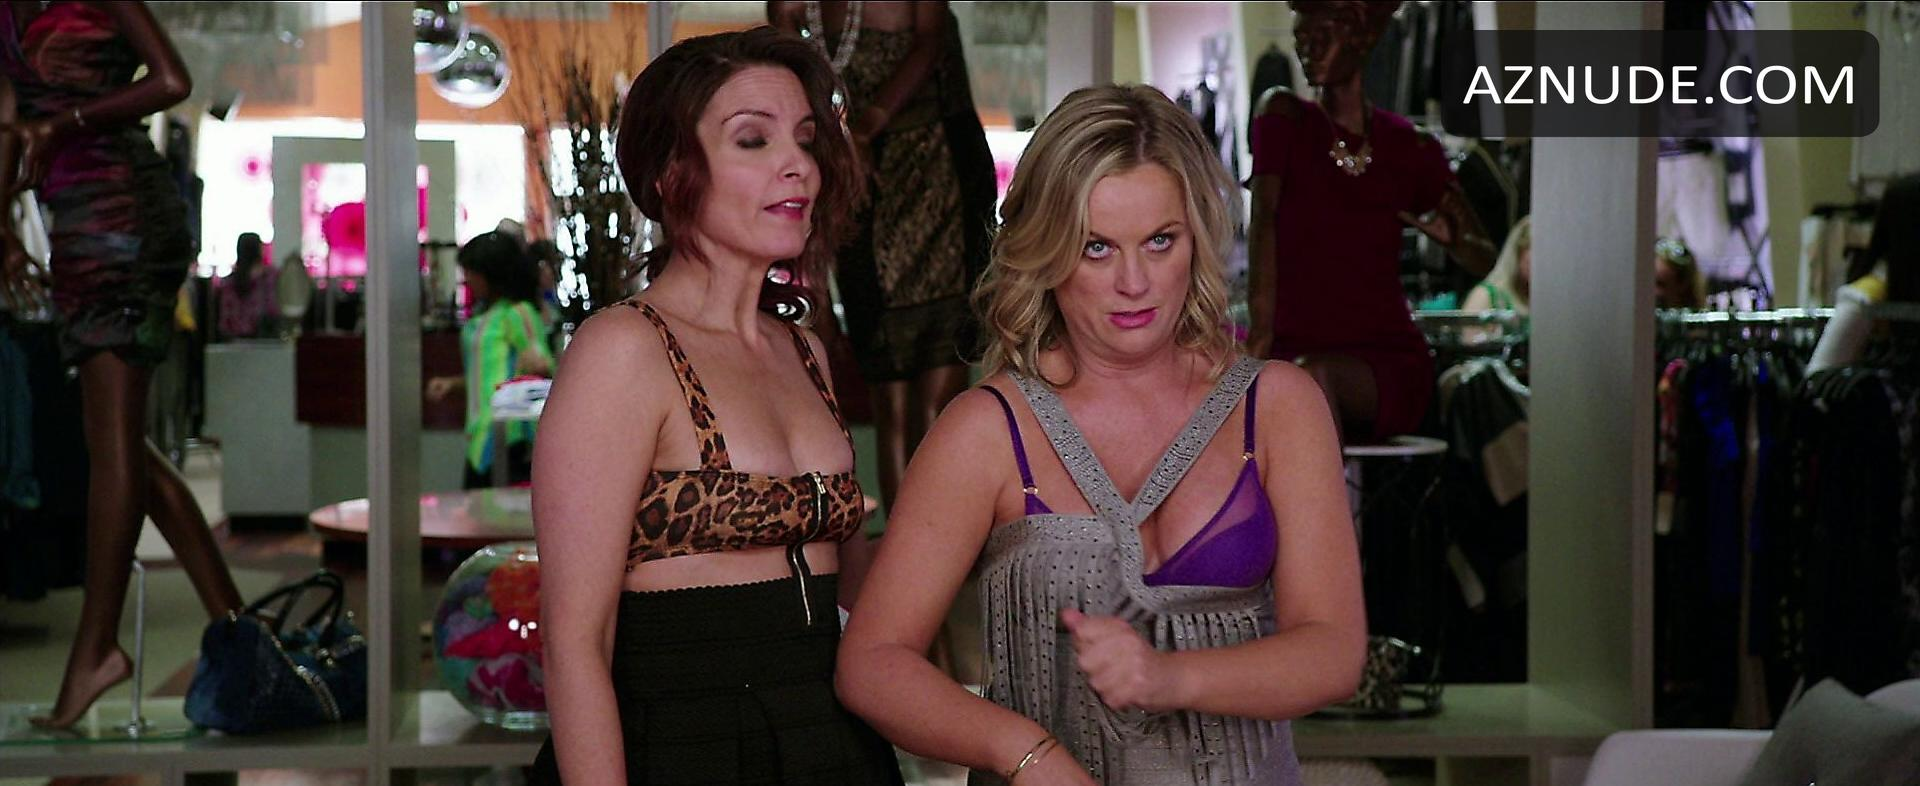 Amy Poehler Desnuda amy poehler nude - aznude